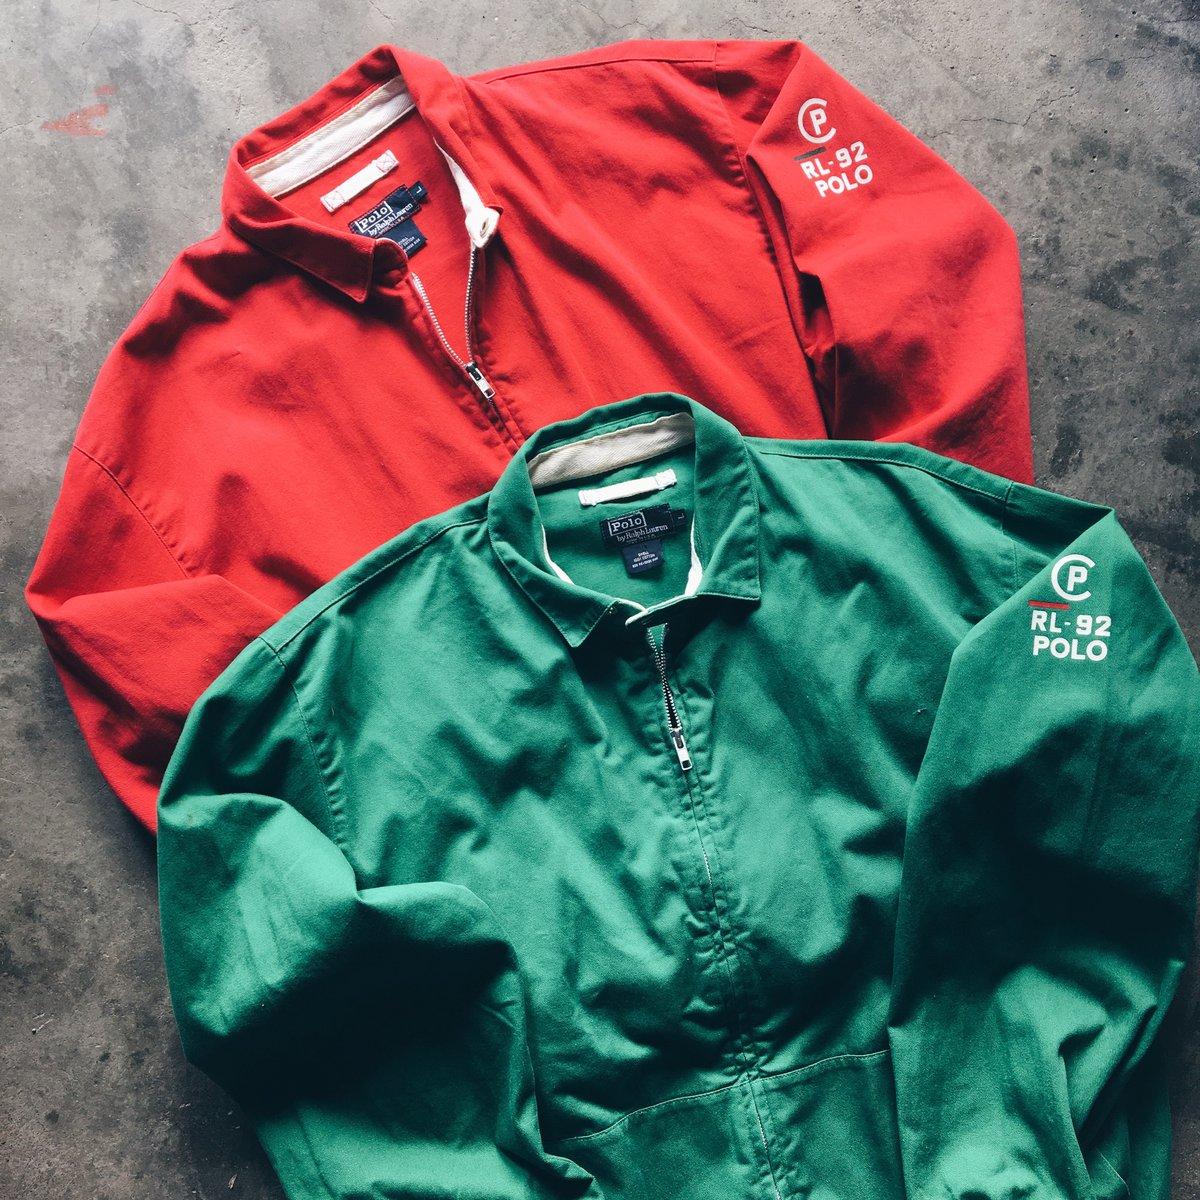 Image of Original 1992 Polo Ralph Lauren RL-92 Jackets.